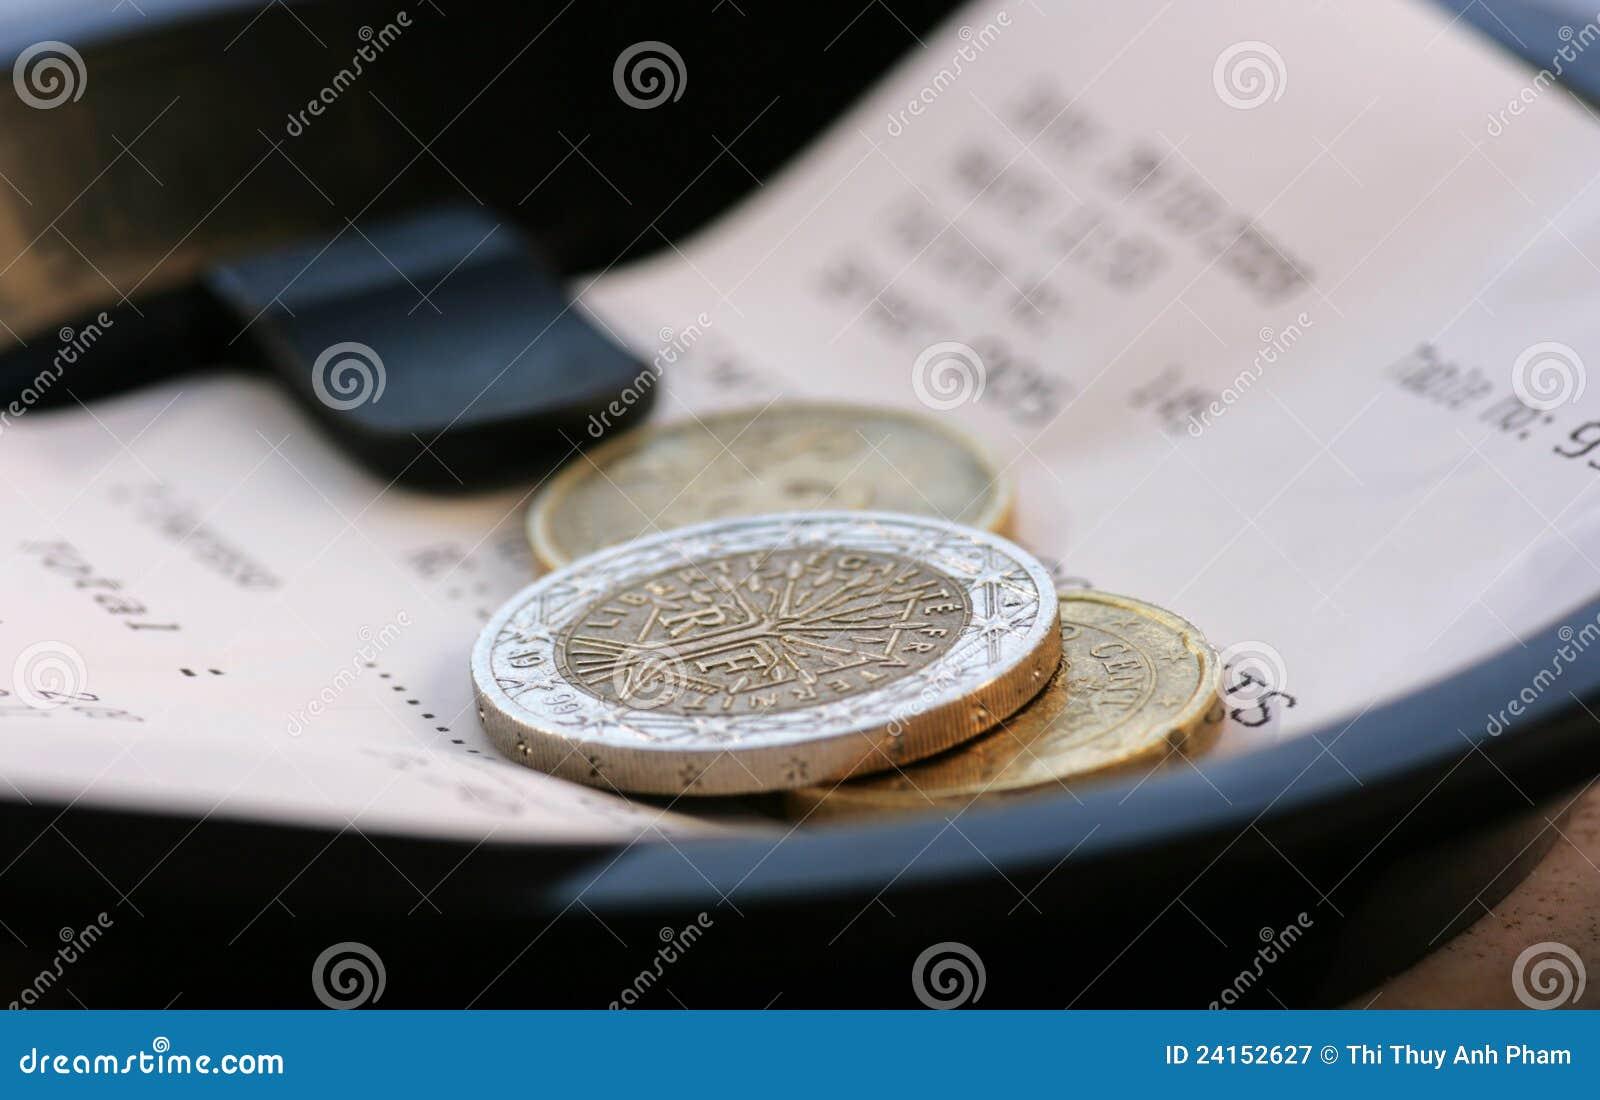 ресторан счета